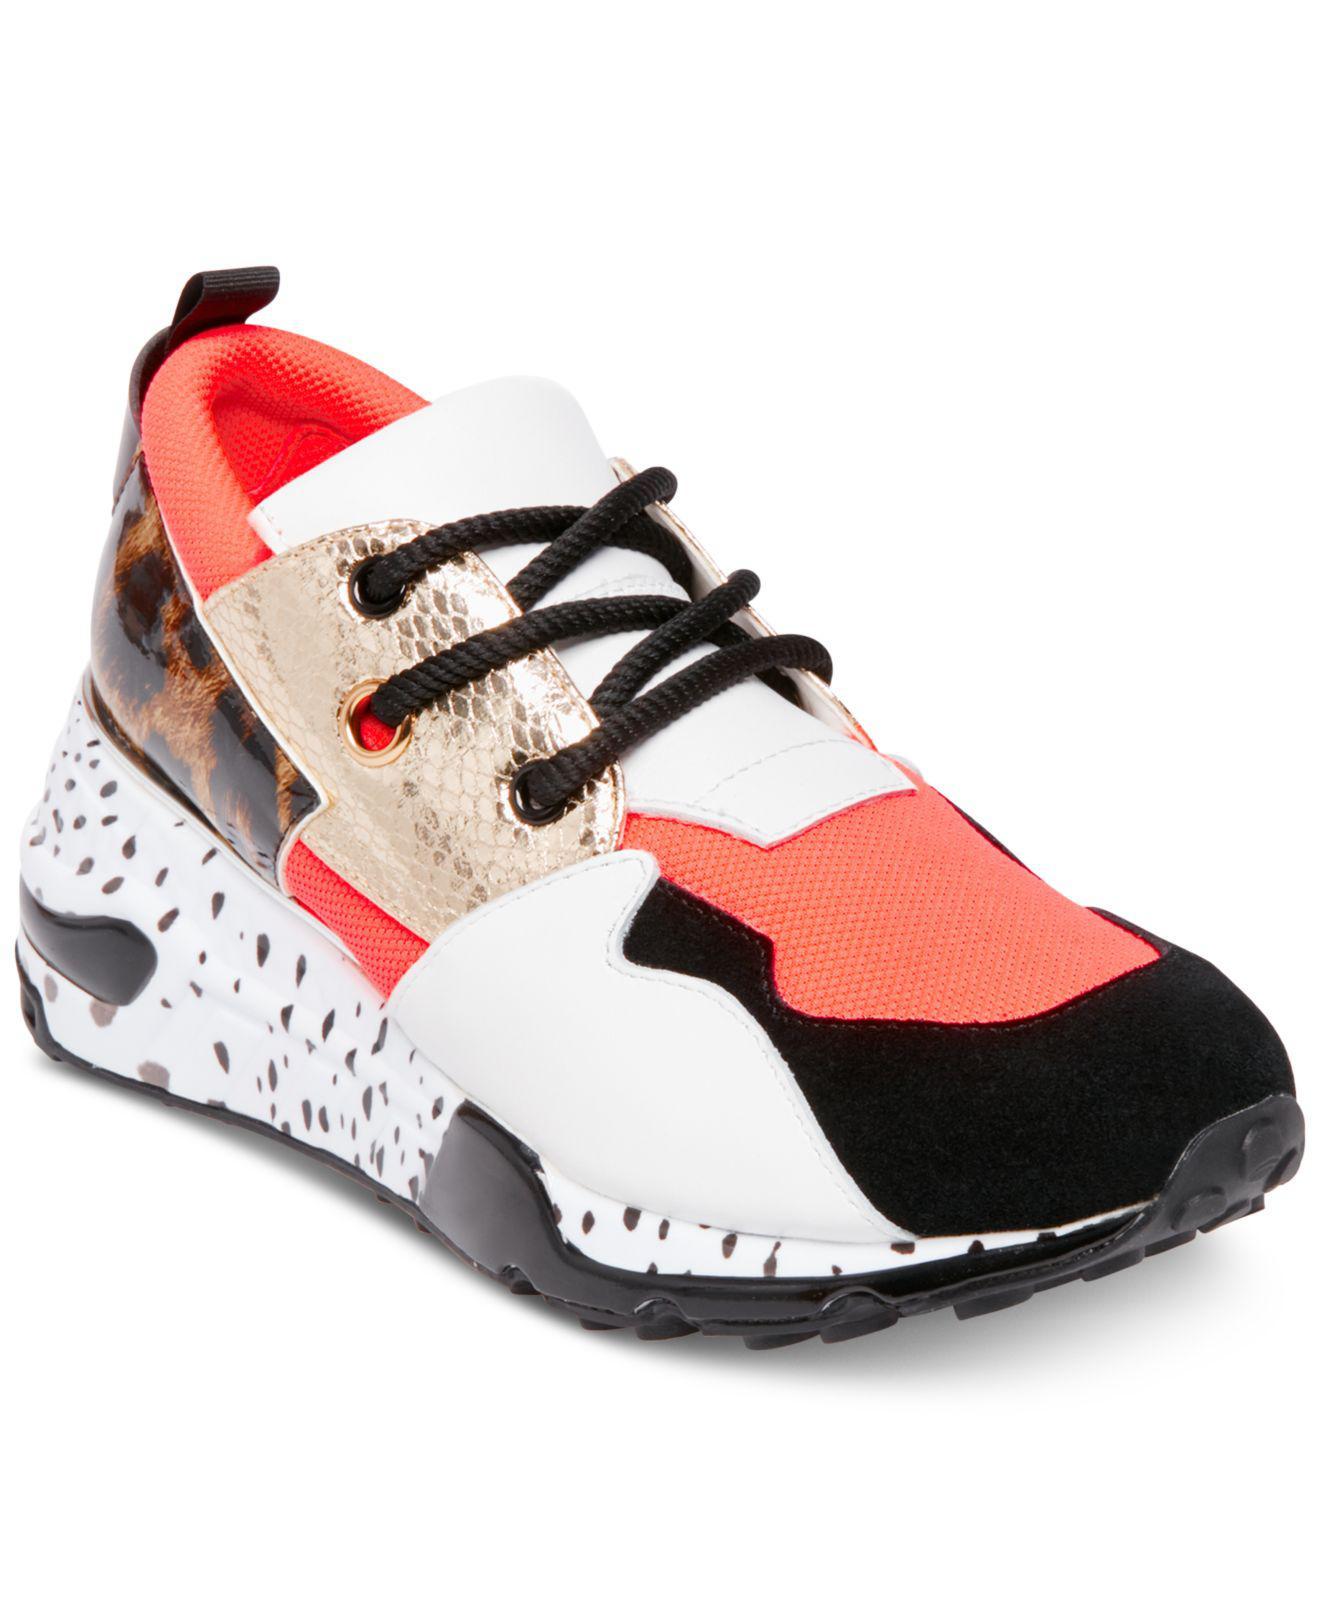 7c0dac32d4f Steve Madden - Multicolor Cliff Sneakers - Lyst. View fullscreen